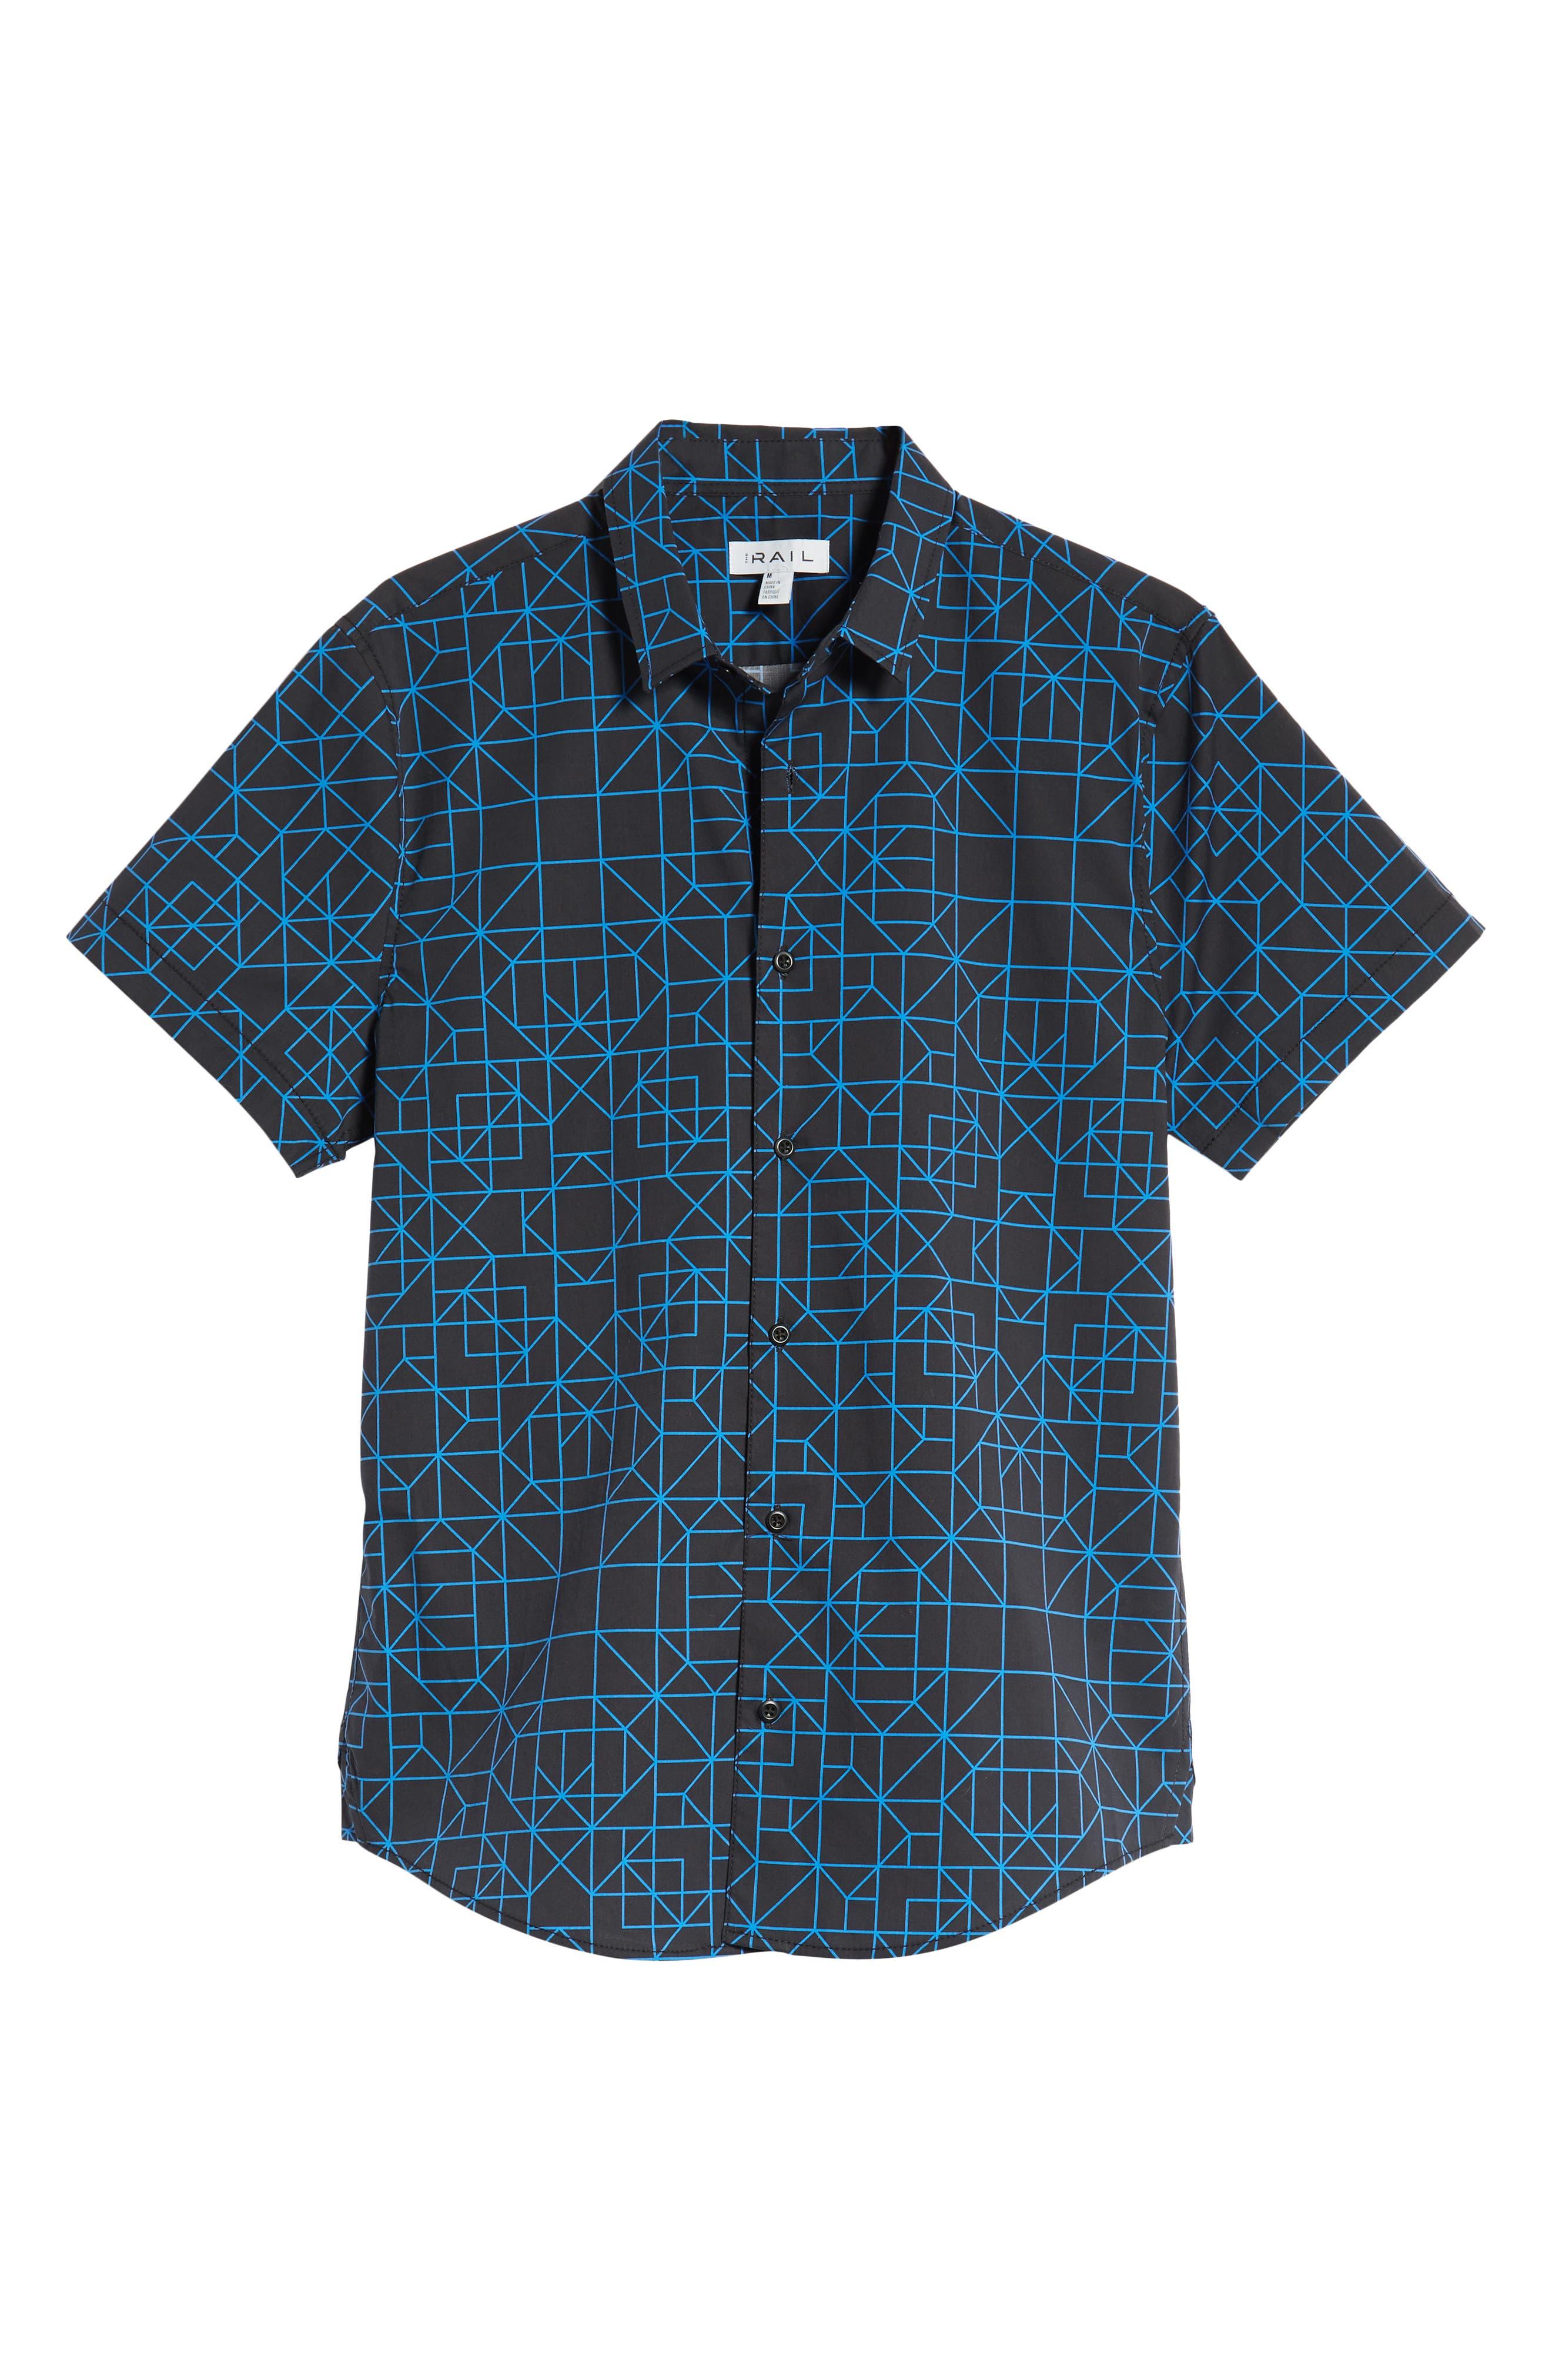 Print Sport Shirt,                             Alternate thumbnail 6, color,                             BLACK BLUE GRID GEO